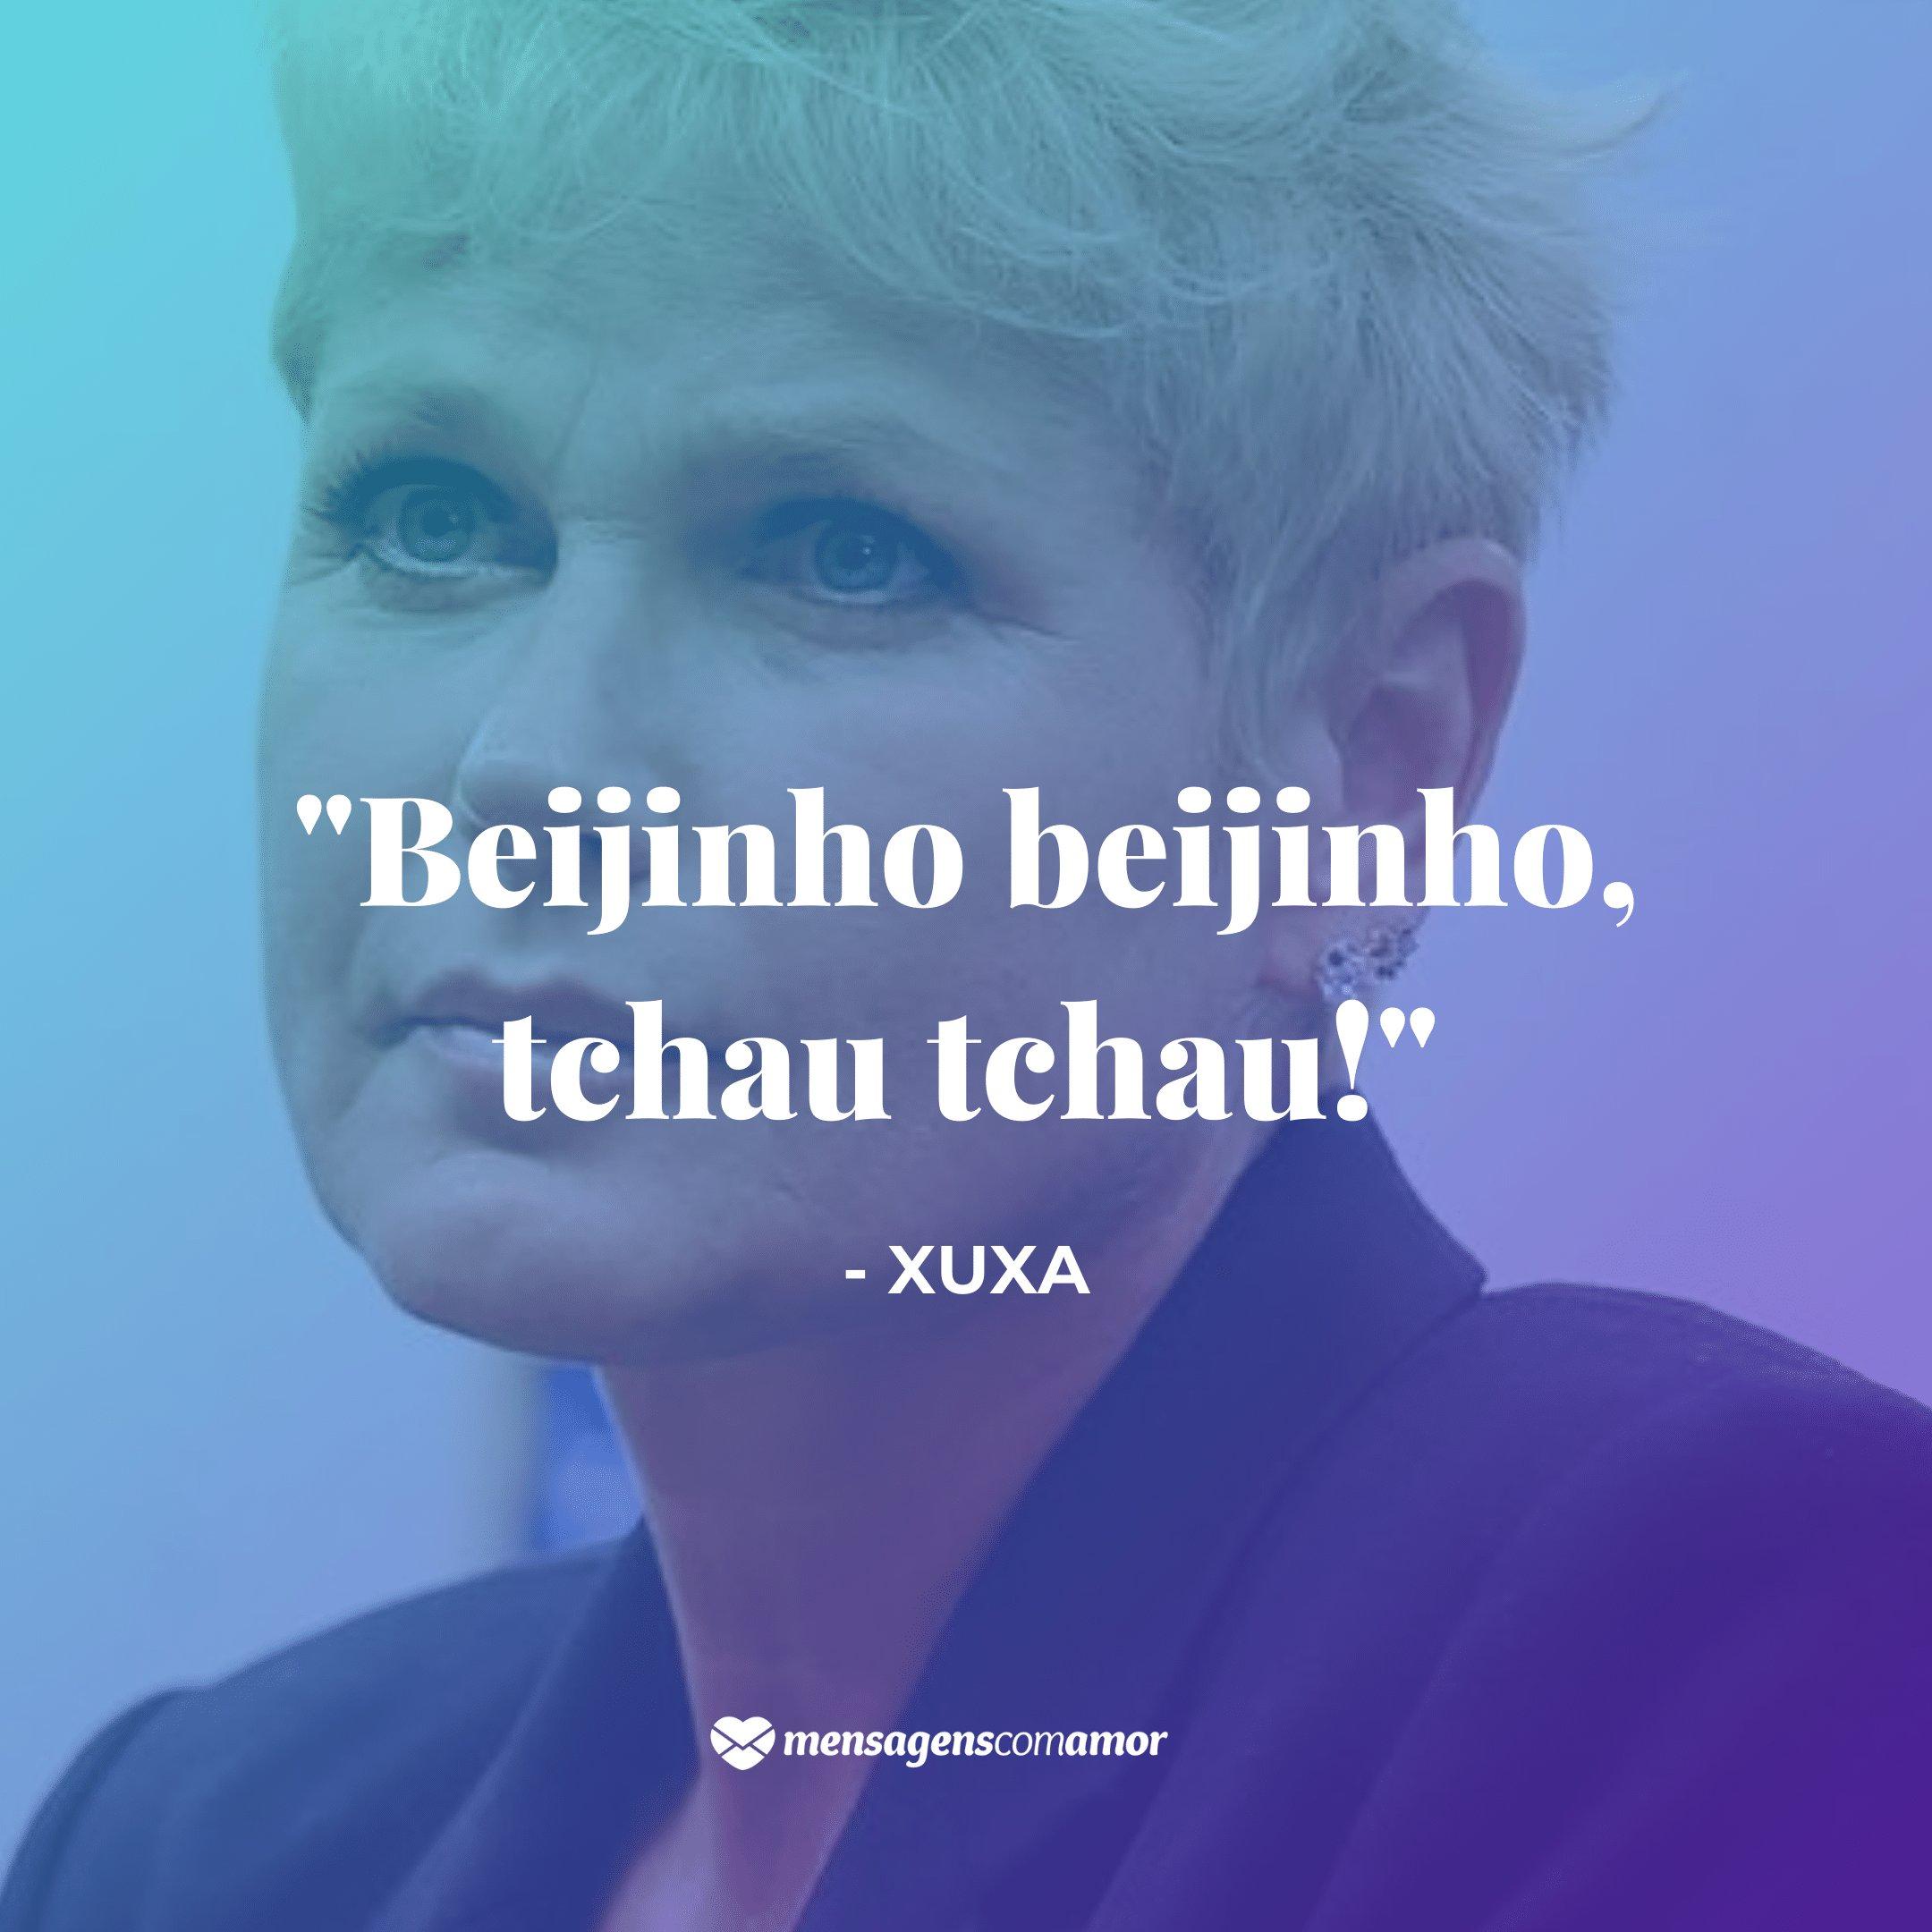 'Beijinho beijinho, tchau tchau!' - Frases de TV